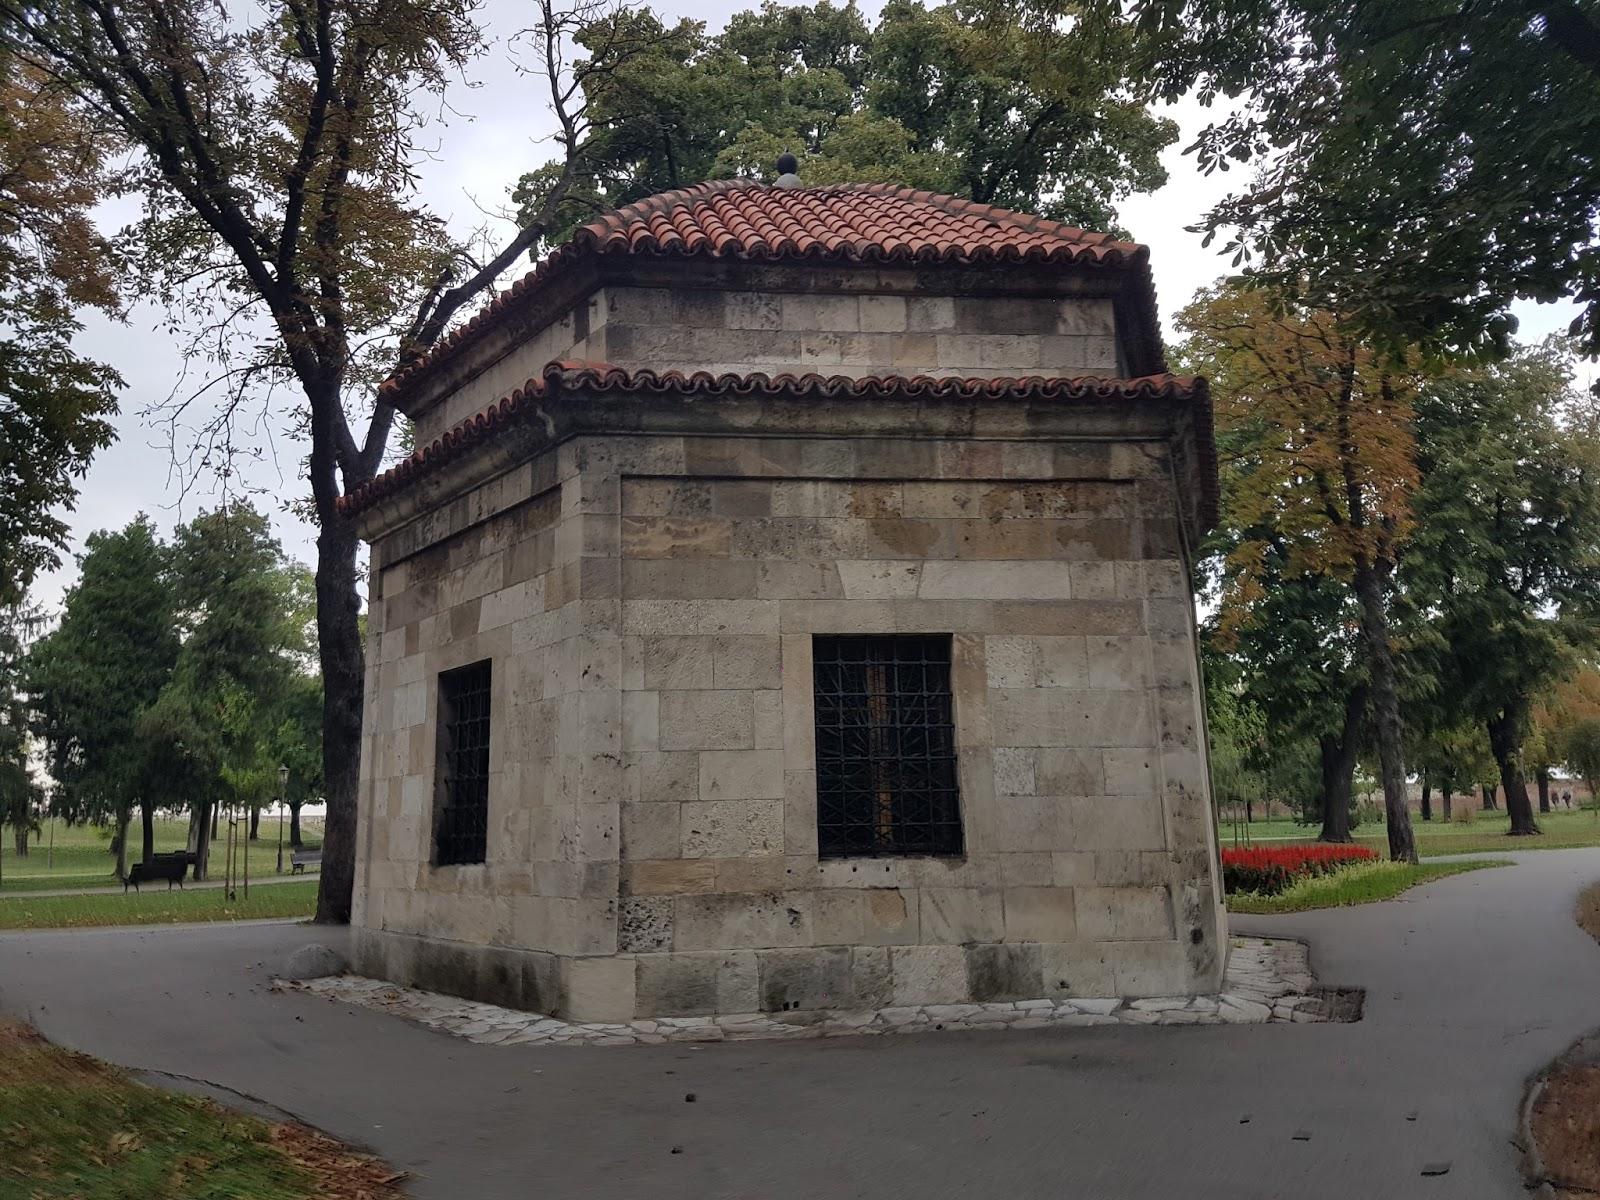 Turska, Šejk Mustafina grobnica na Kalemegdanu